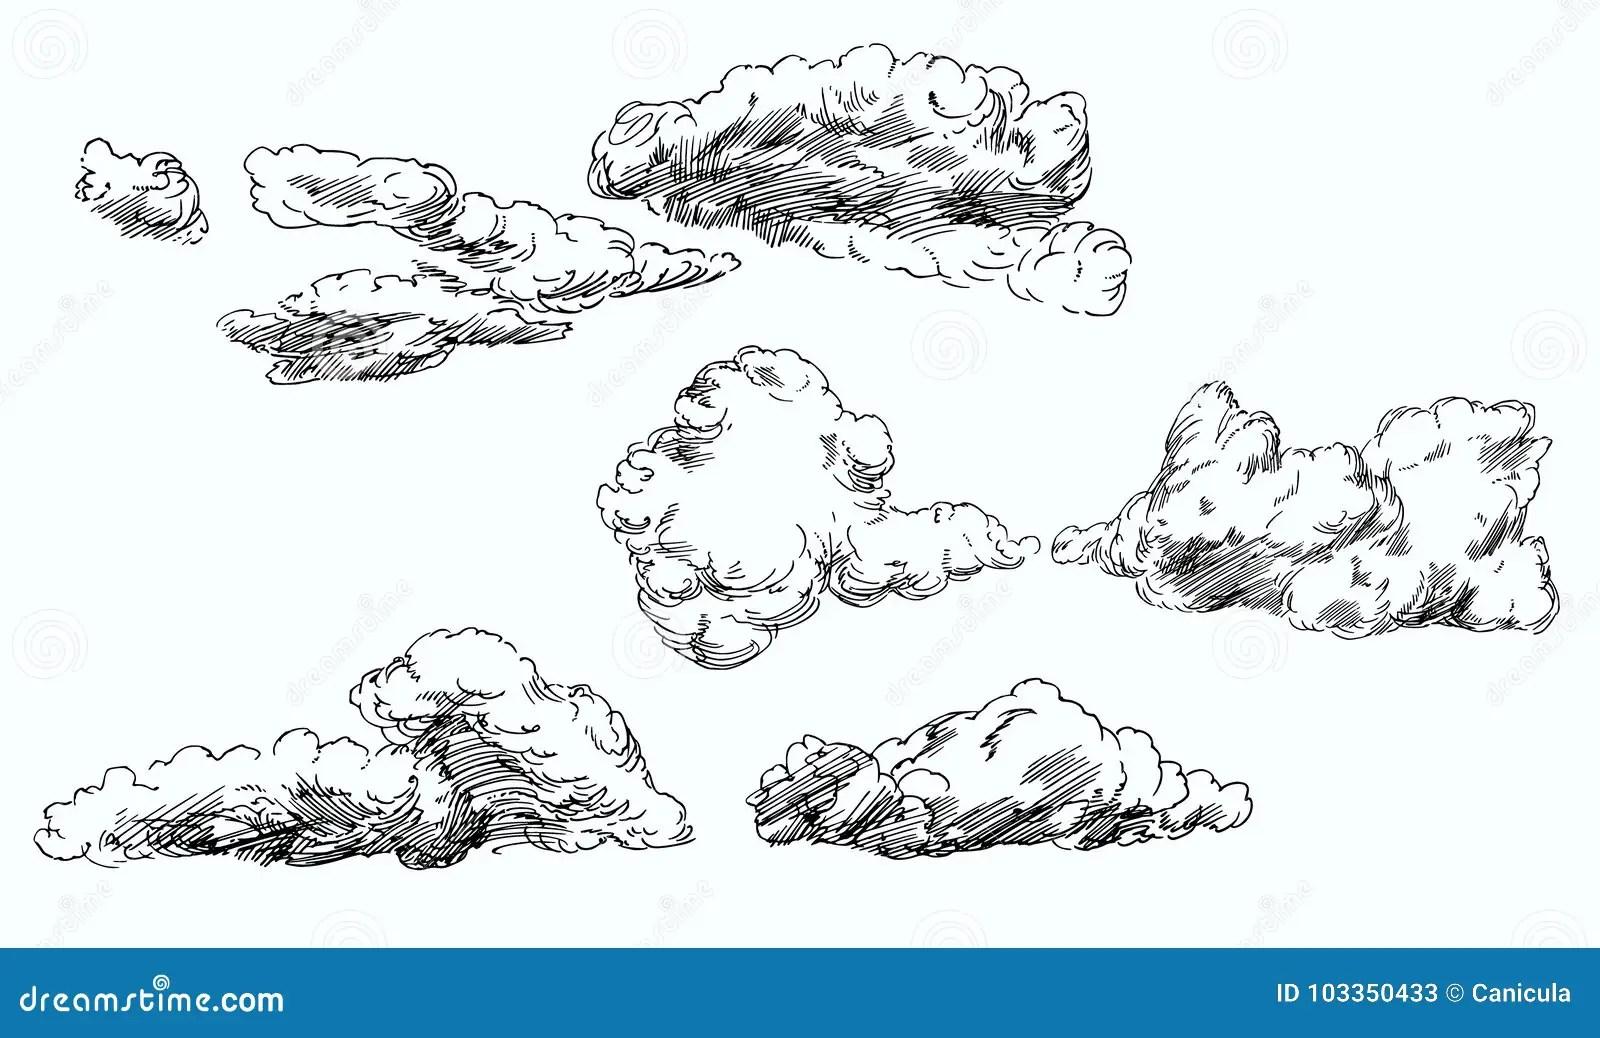 diagram of a tornado cloud formation